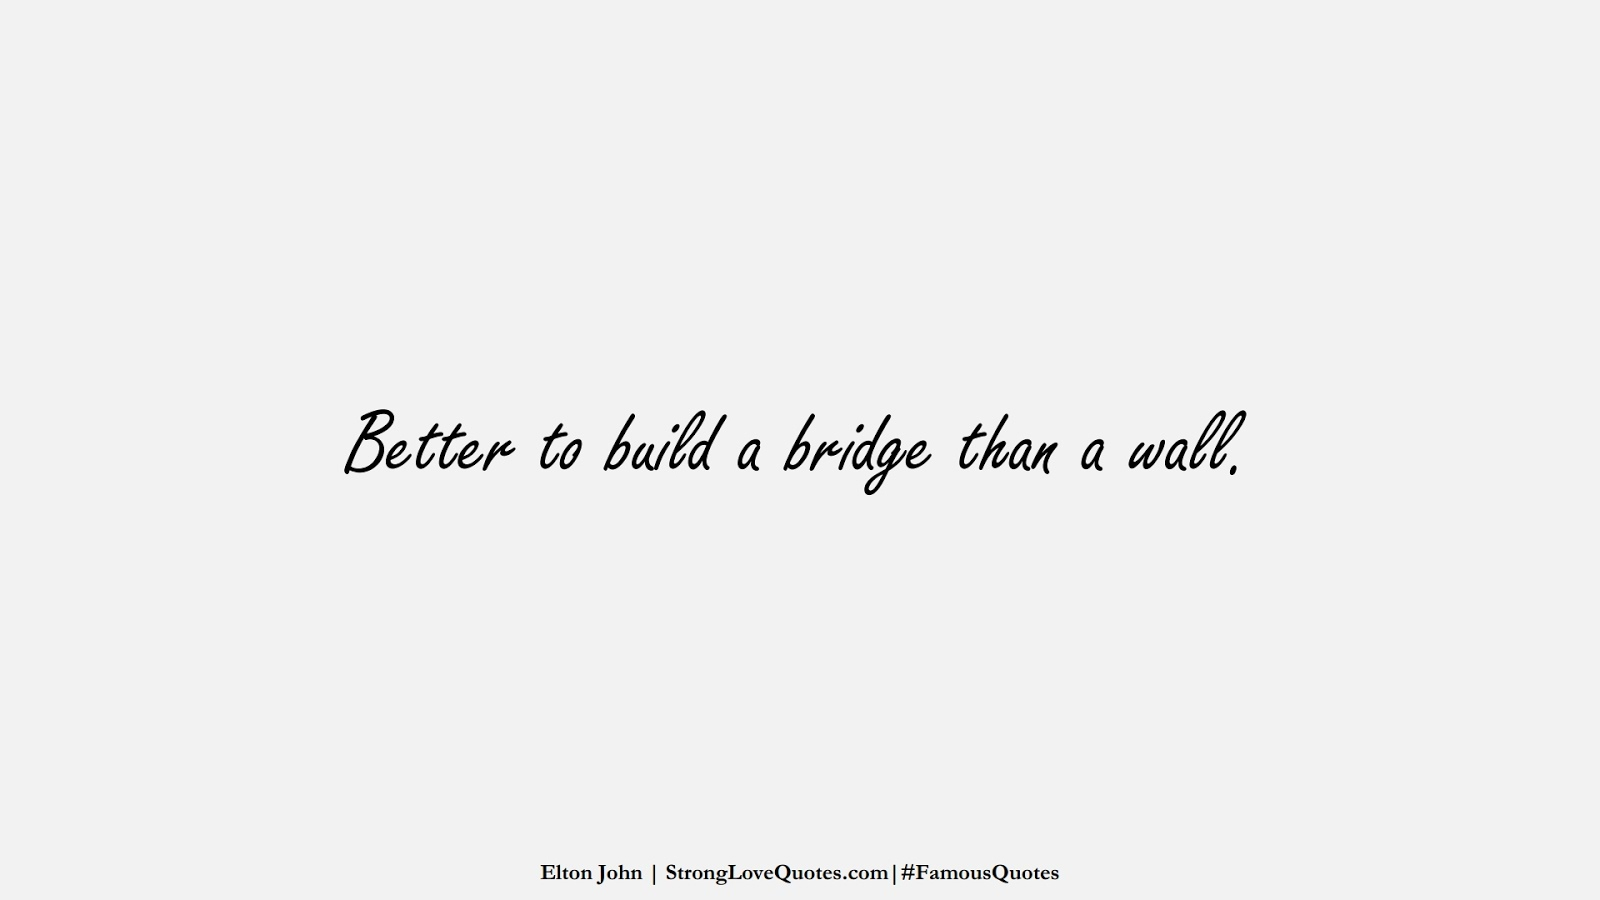 Better to build a bridge than a wall. (Elton John);  #FamousQuotes